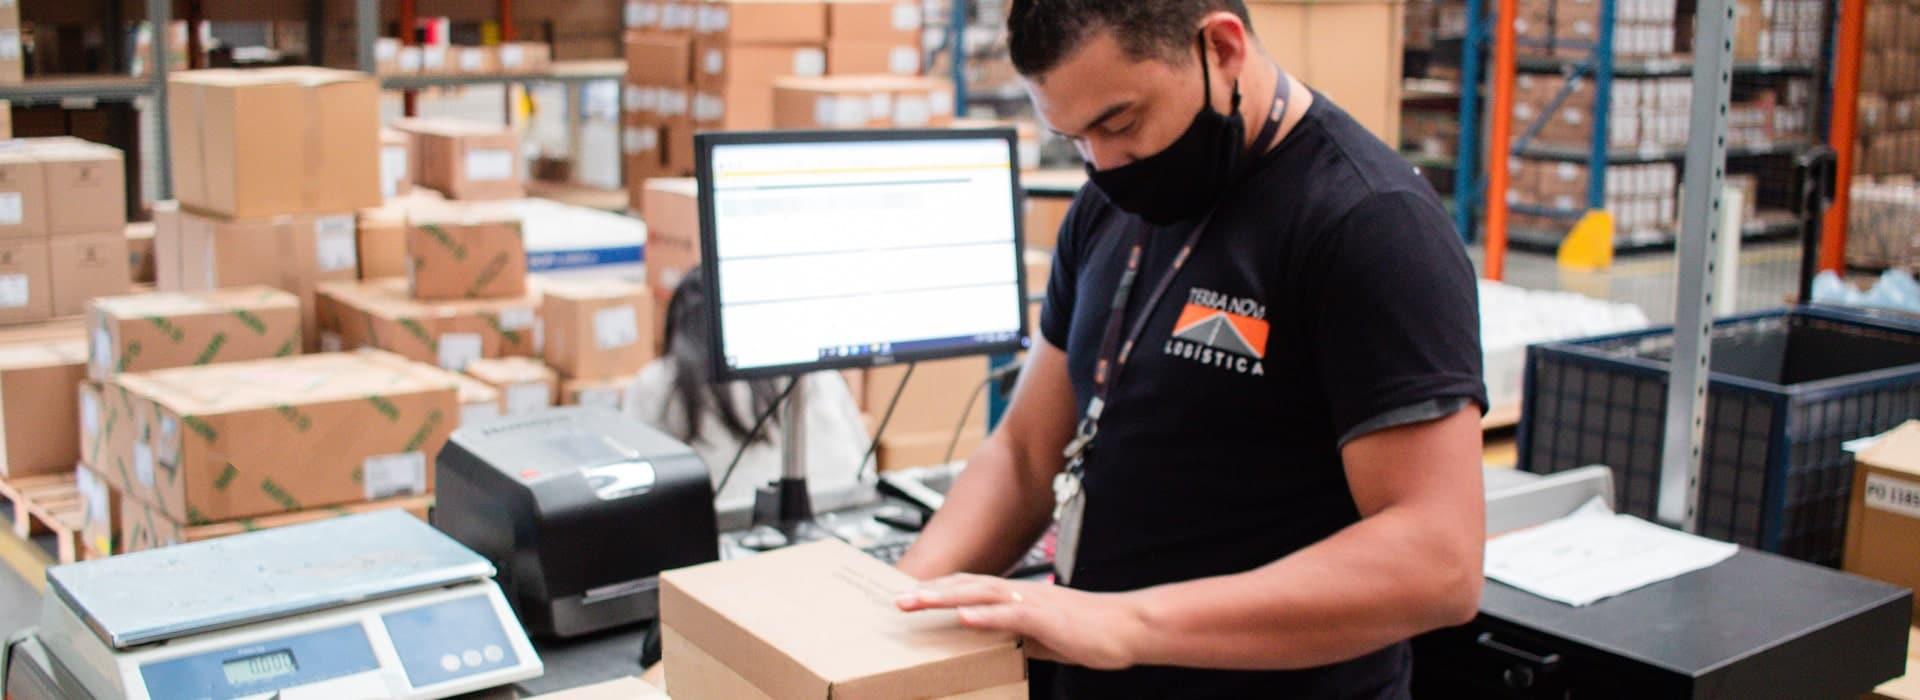 inovação e tecnologia na logística tn